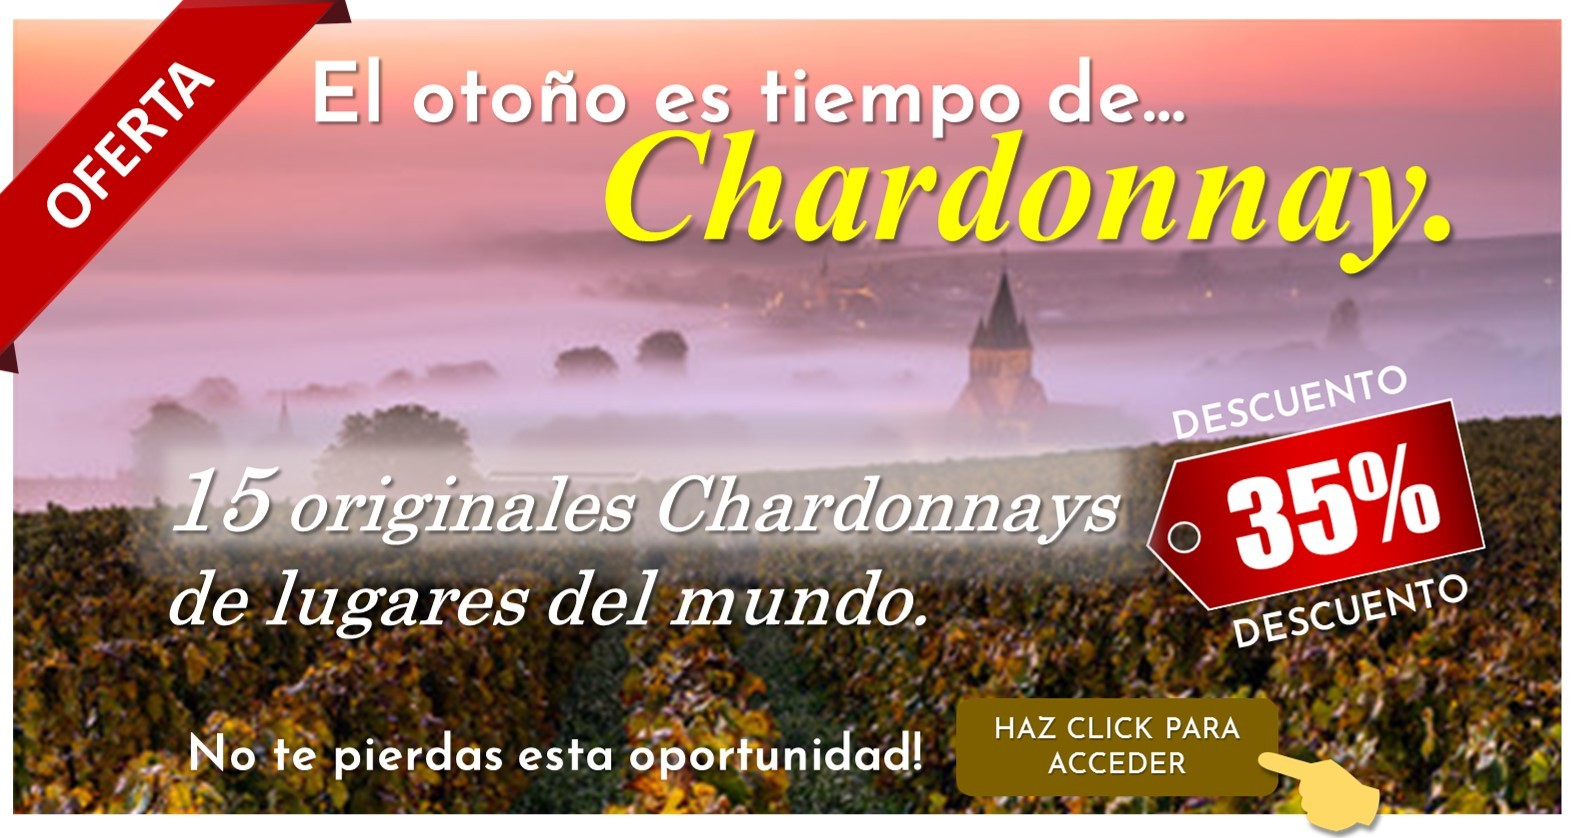 Chardonnay es para otoño